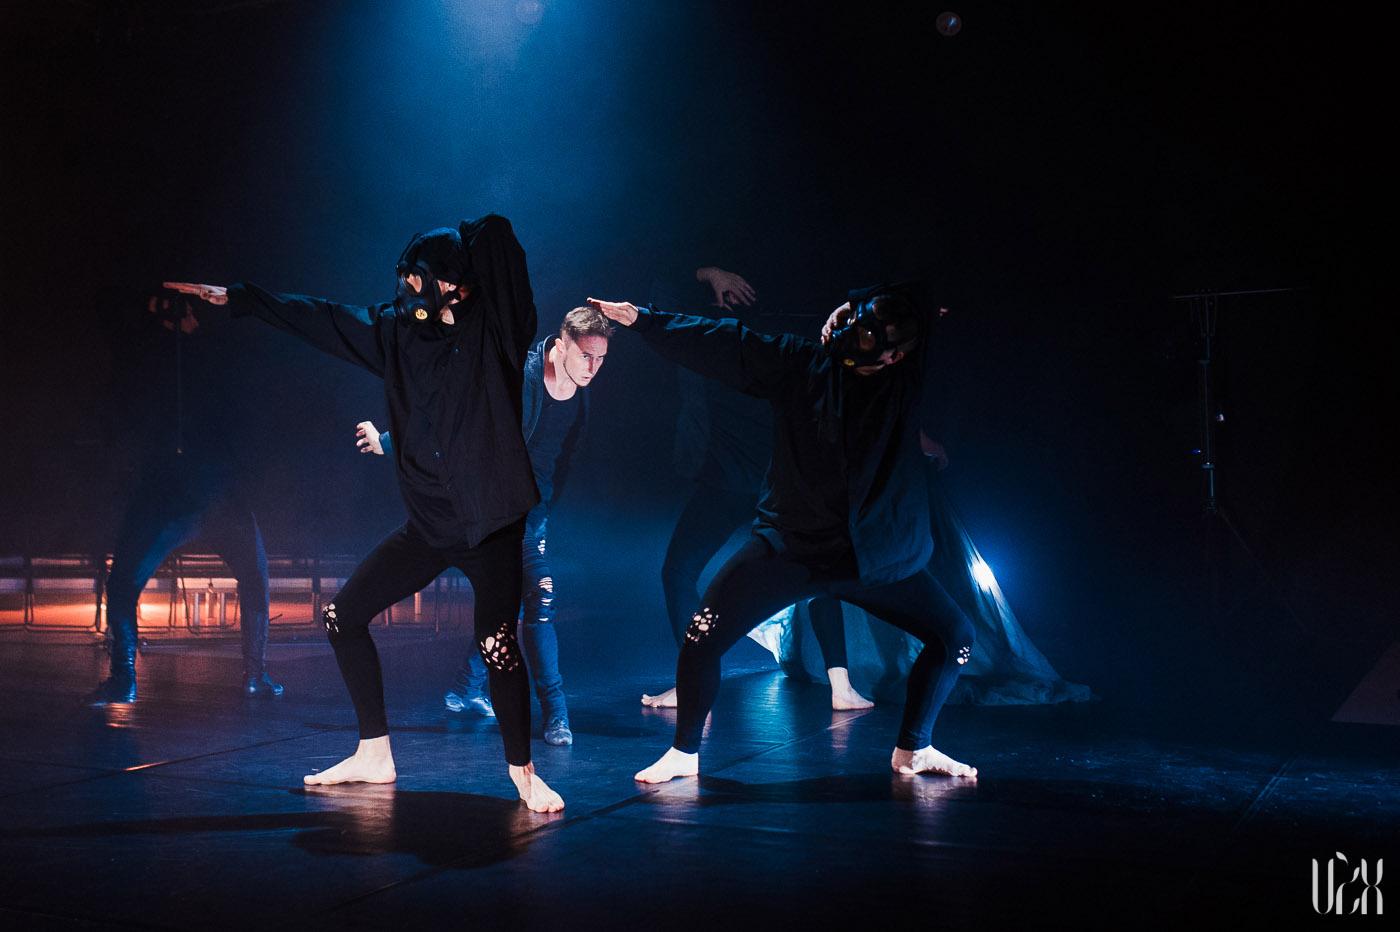 E.sabaliauskaite Vzx.lt Faustas Teatras Event 004